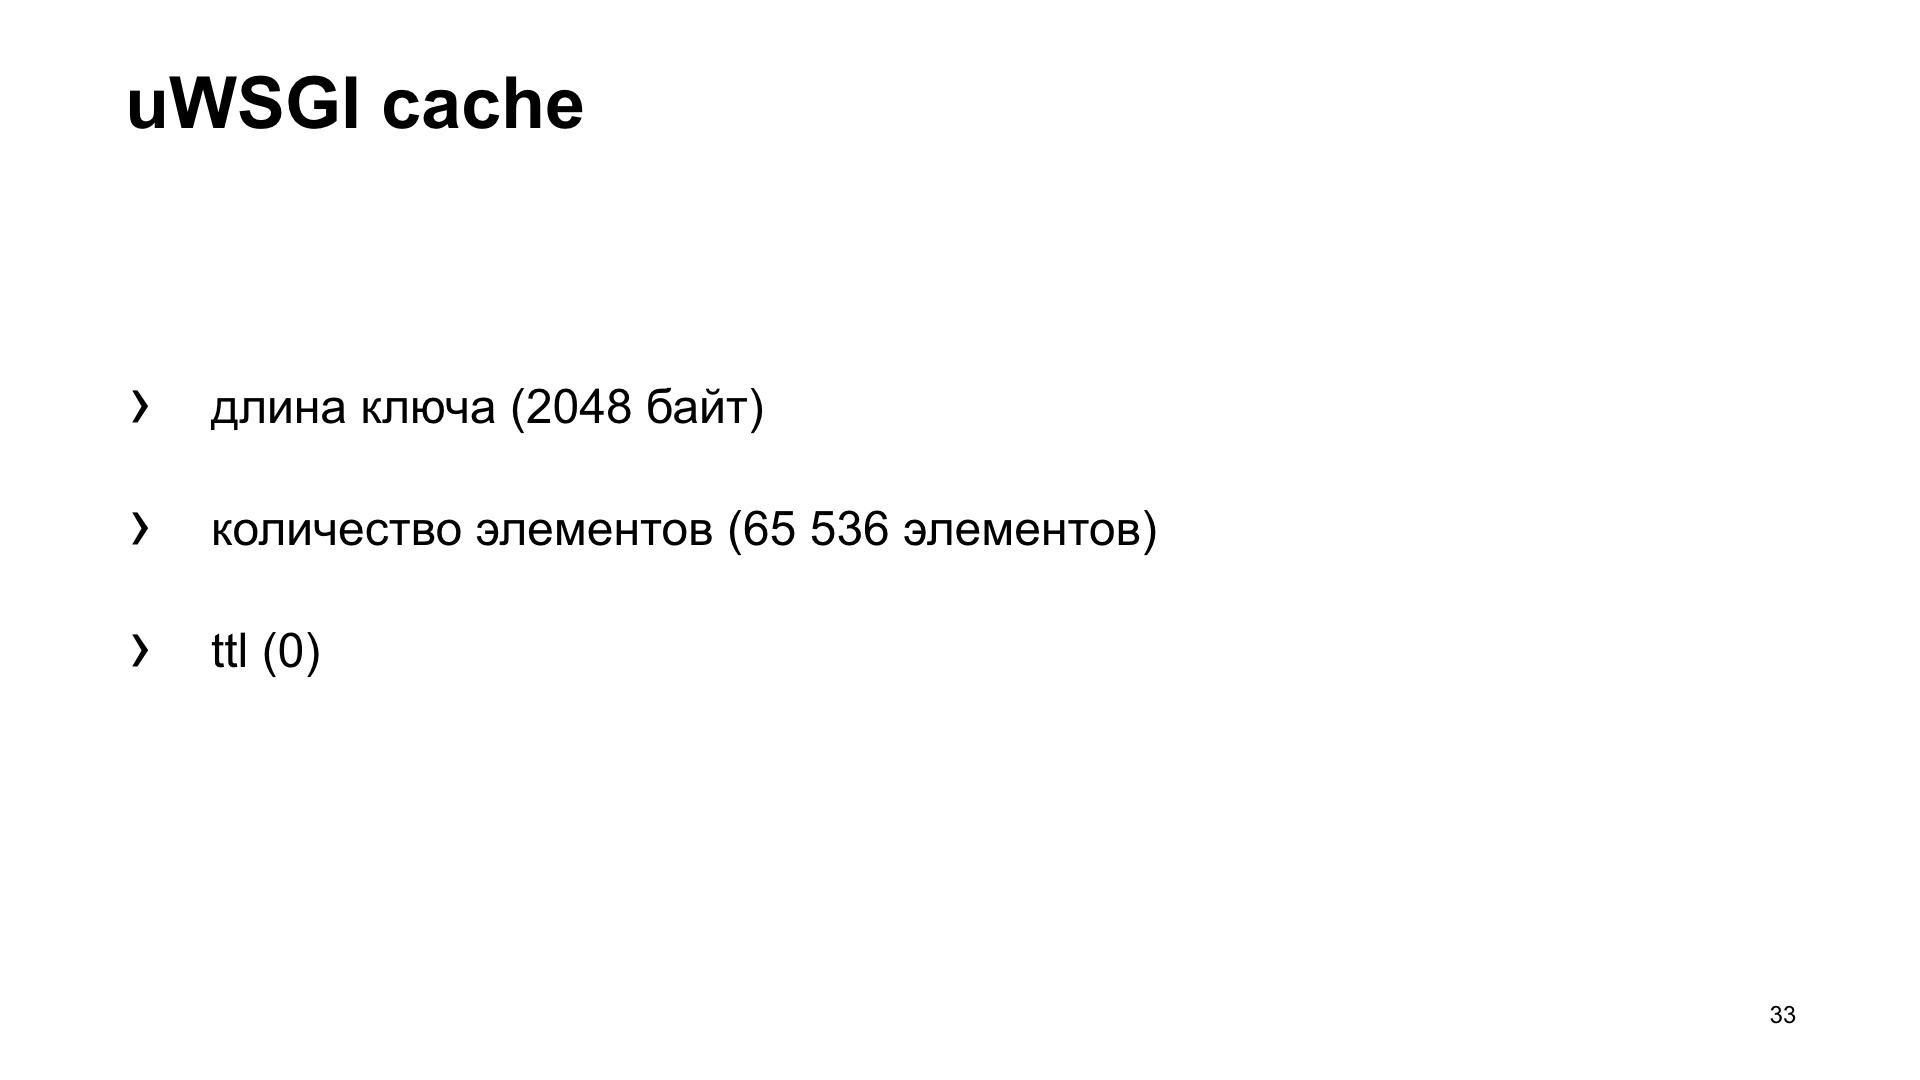 uWSGI в помощь метрикам. Доклад Яндекса - 25